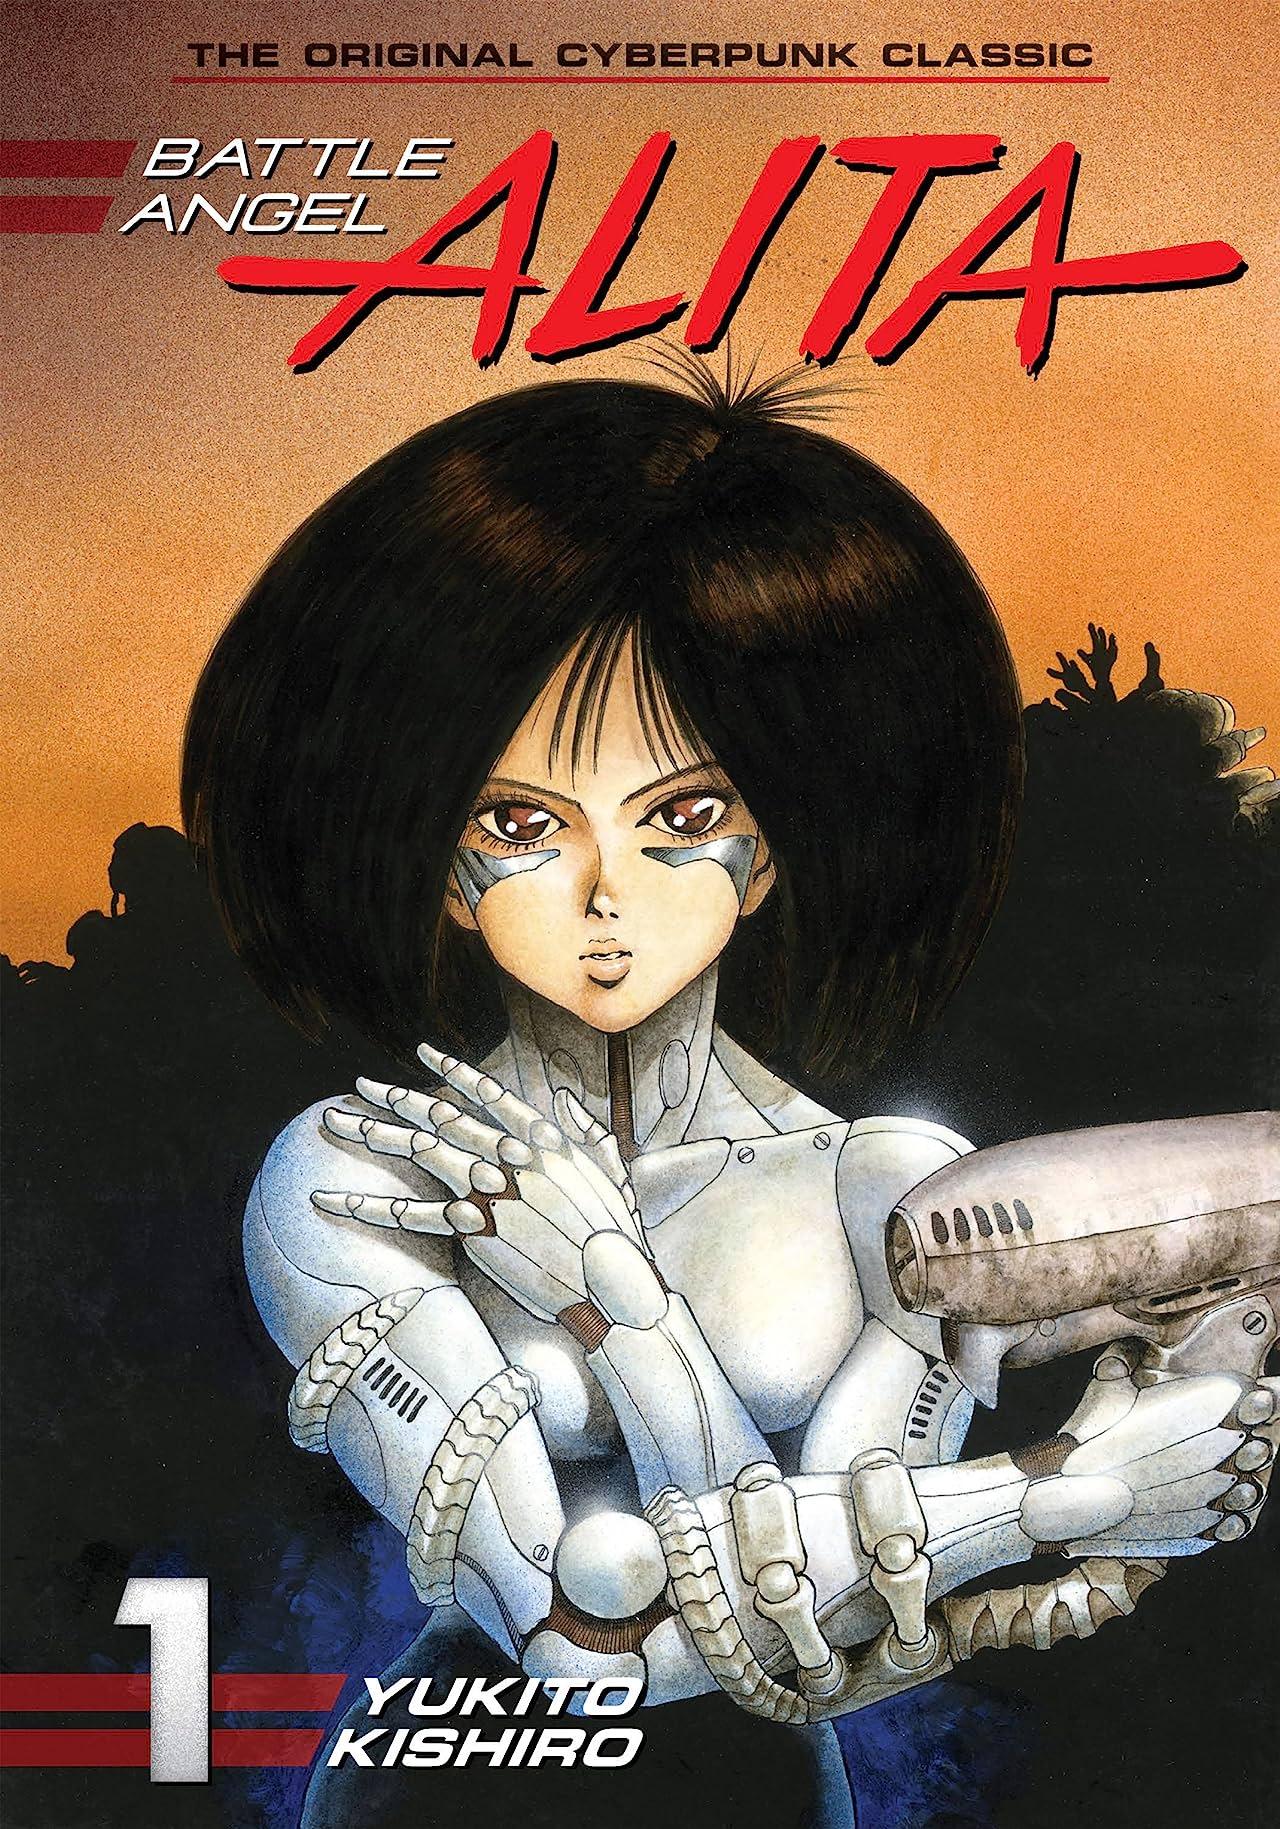 Battle Angel Alita 1 (Comixology)